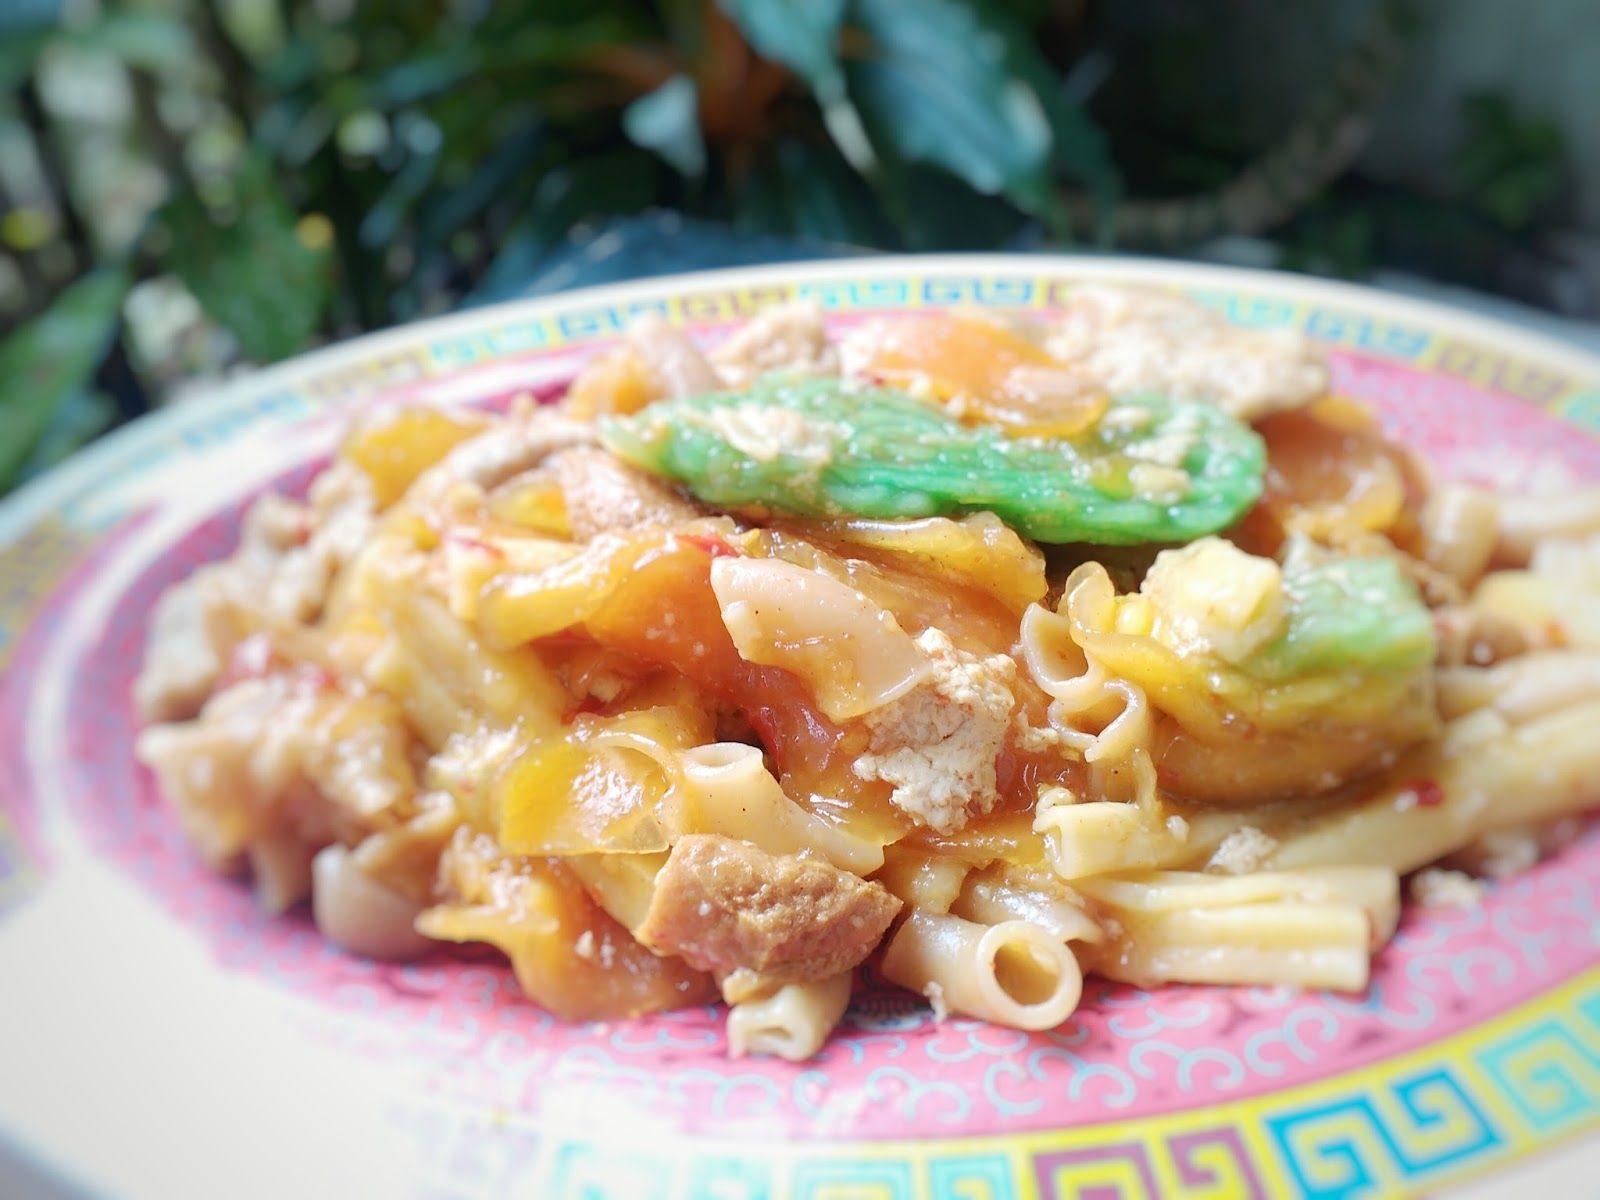 Resep Segala Masakan Resep Seblak Kerupuk Campur Resep Masakan Masakan Makanan Dan Minuman